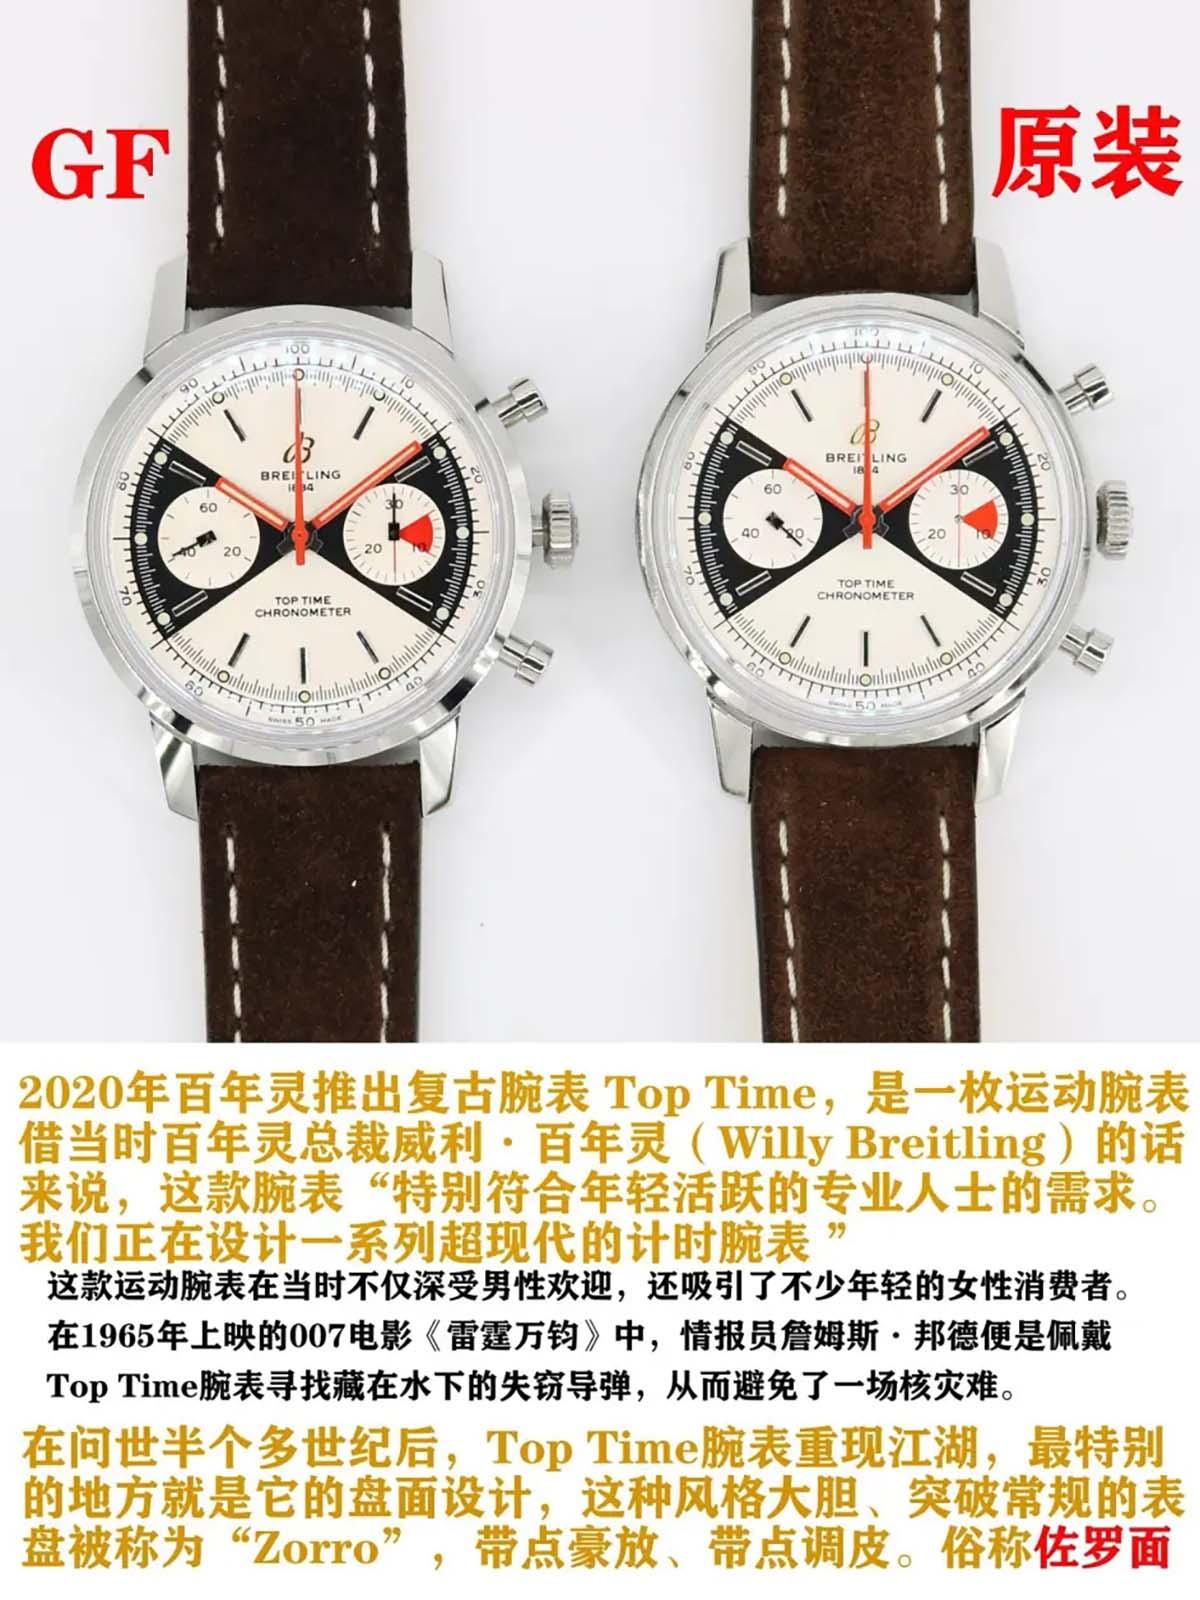 GF厂复刻版TopTime系列佐罗盘腕表做工细节如何-对比正品图文评测